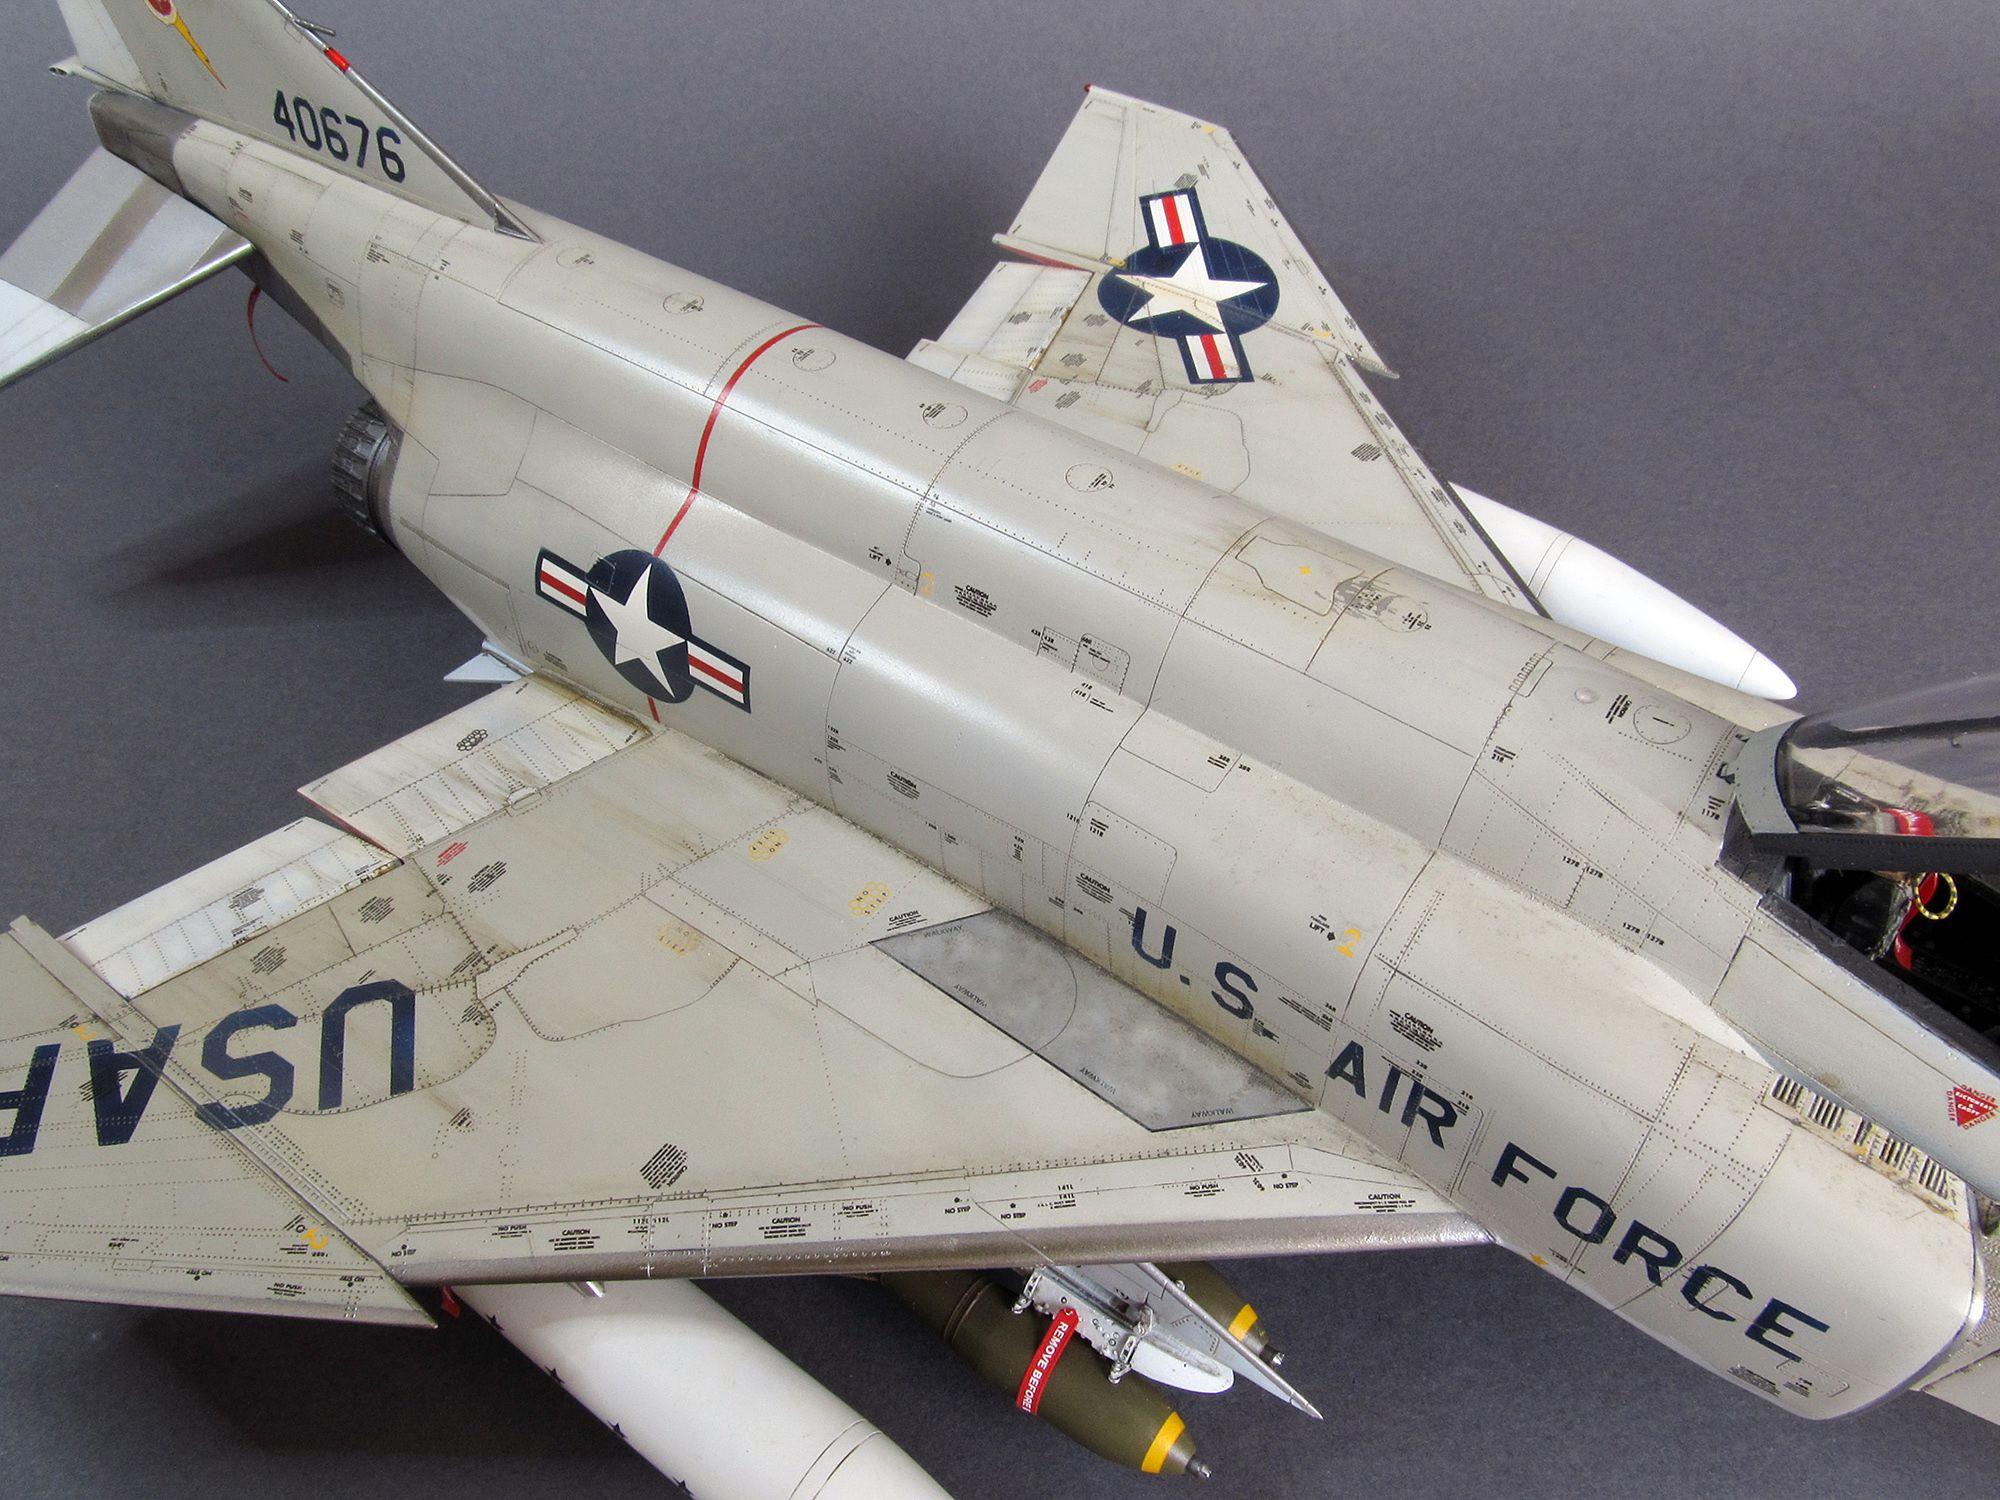 McDonnell F4C Phantom II, USAF (1/48, Eduard) The